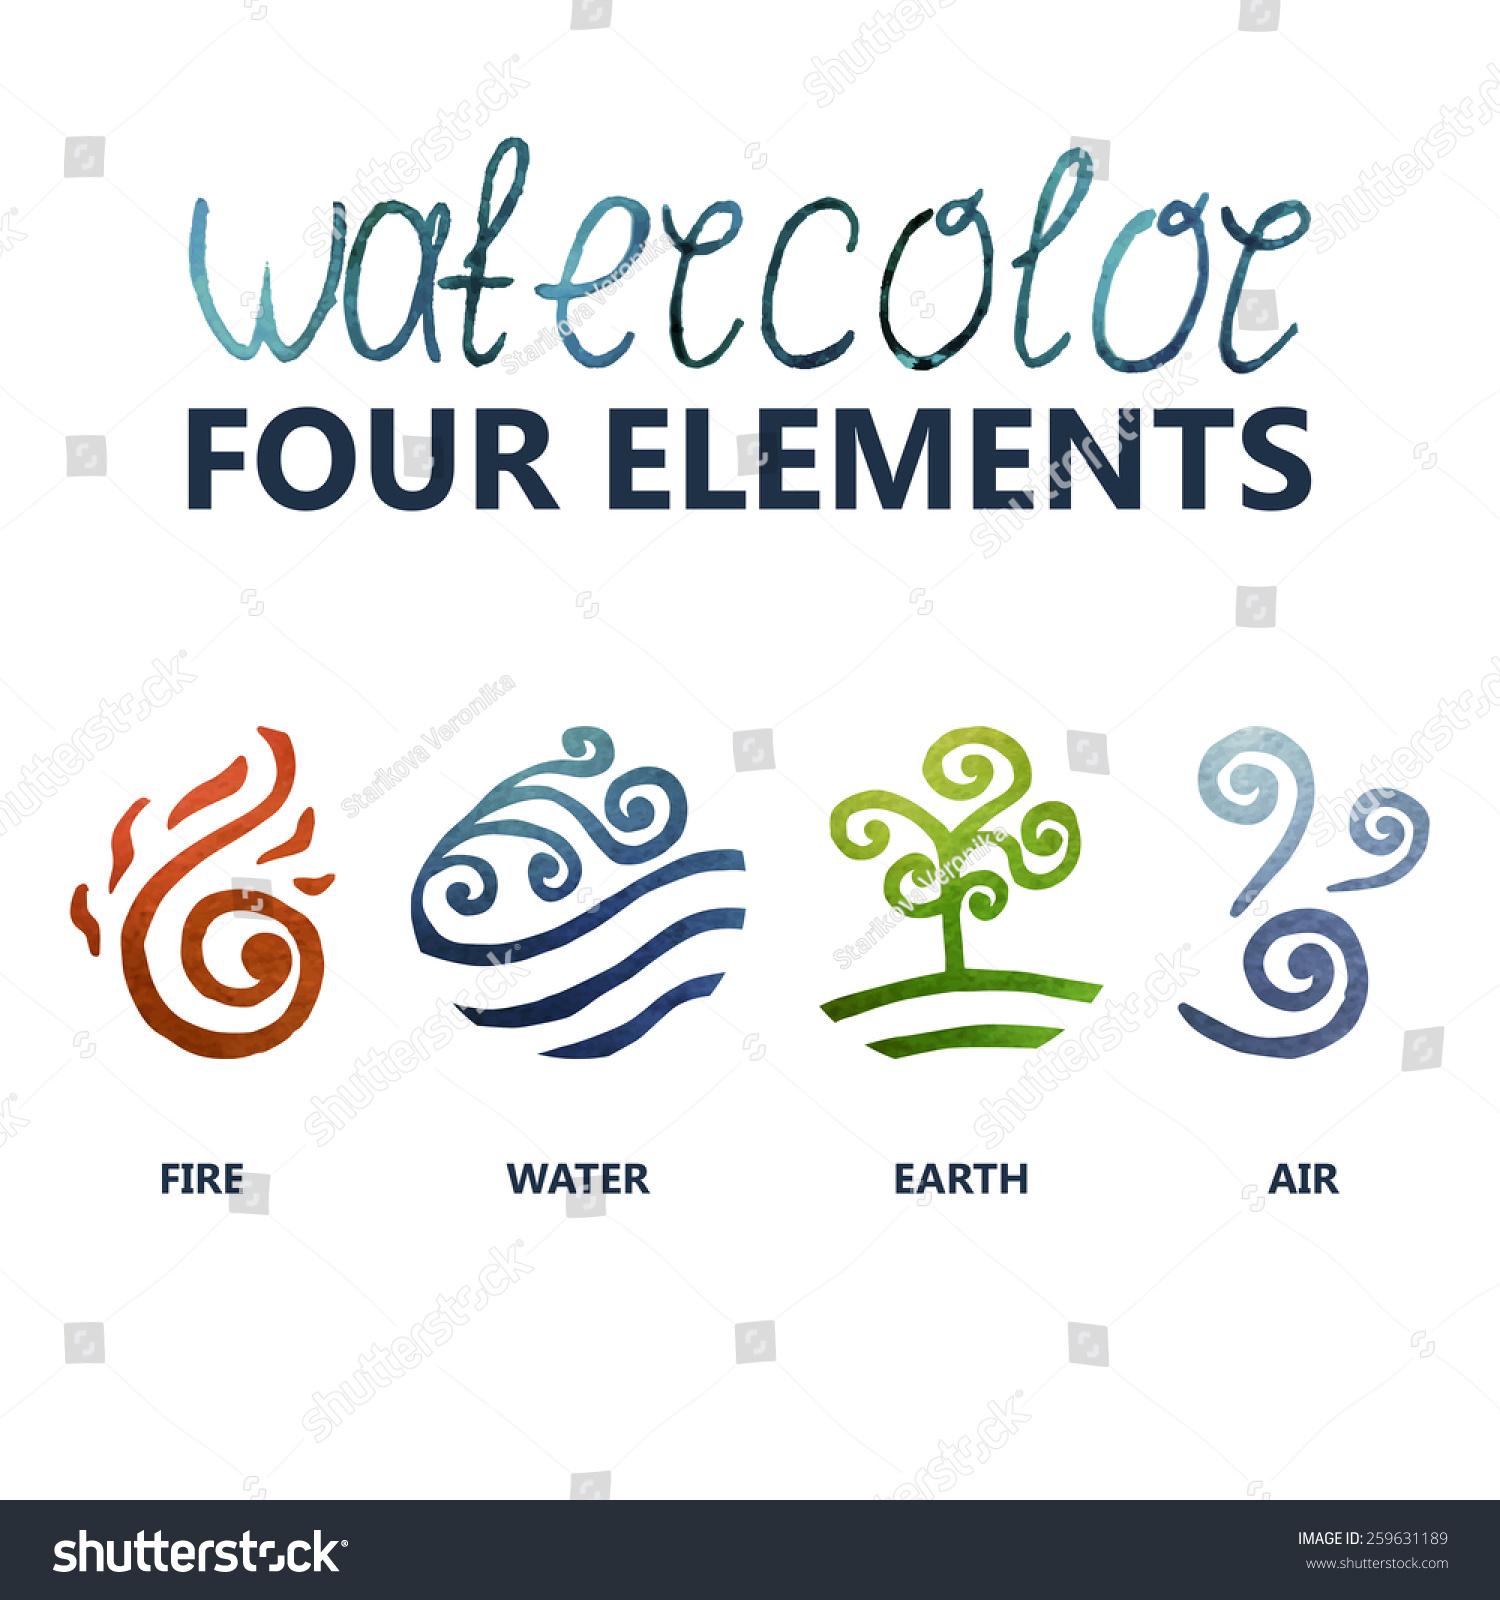 Four Elements Watercolour Artist Tuffytats: Four Elements Watercolor (Fire, Water, Earth, Air) Stock